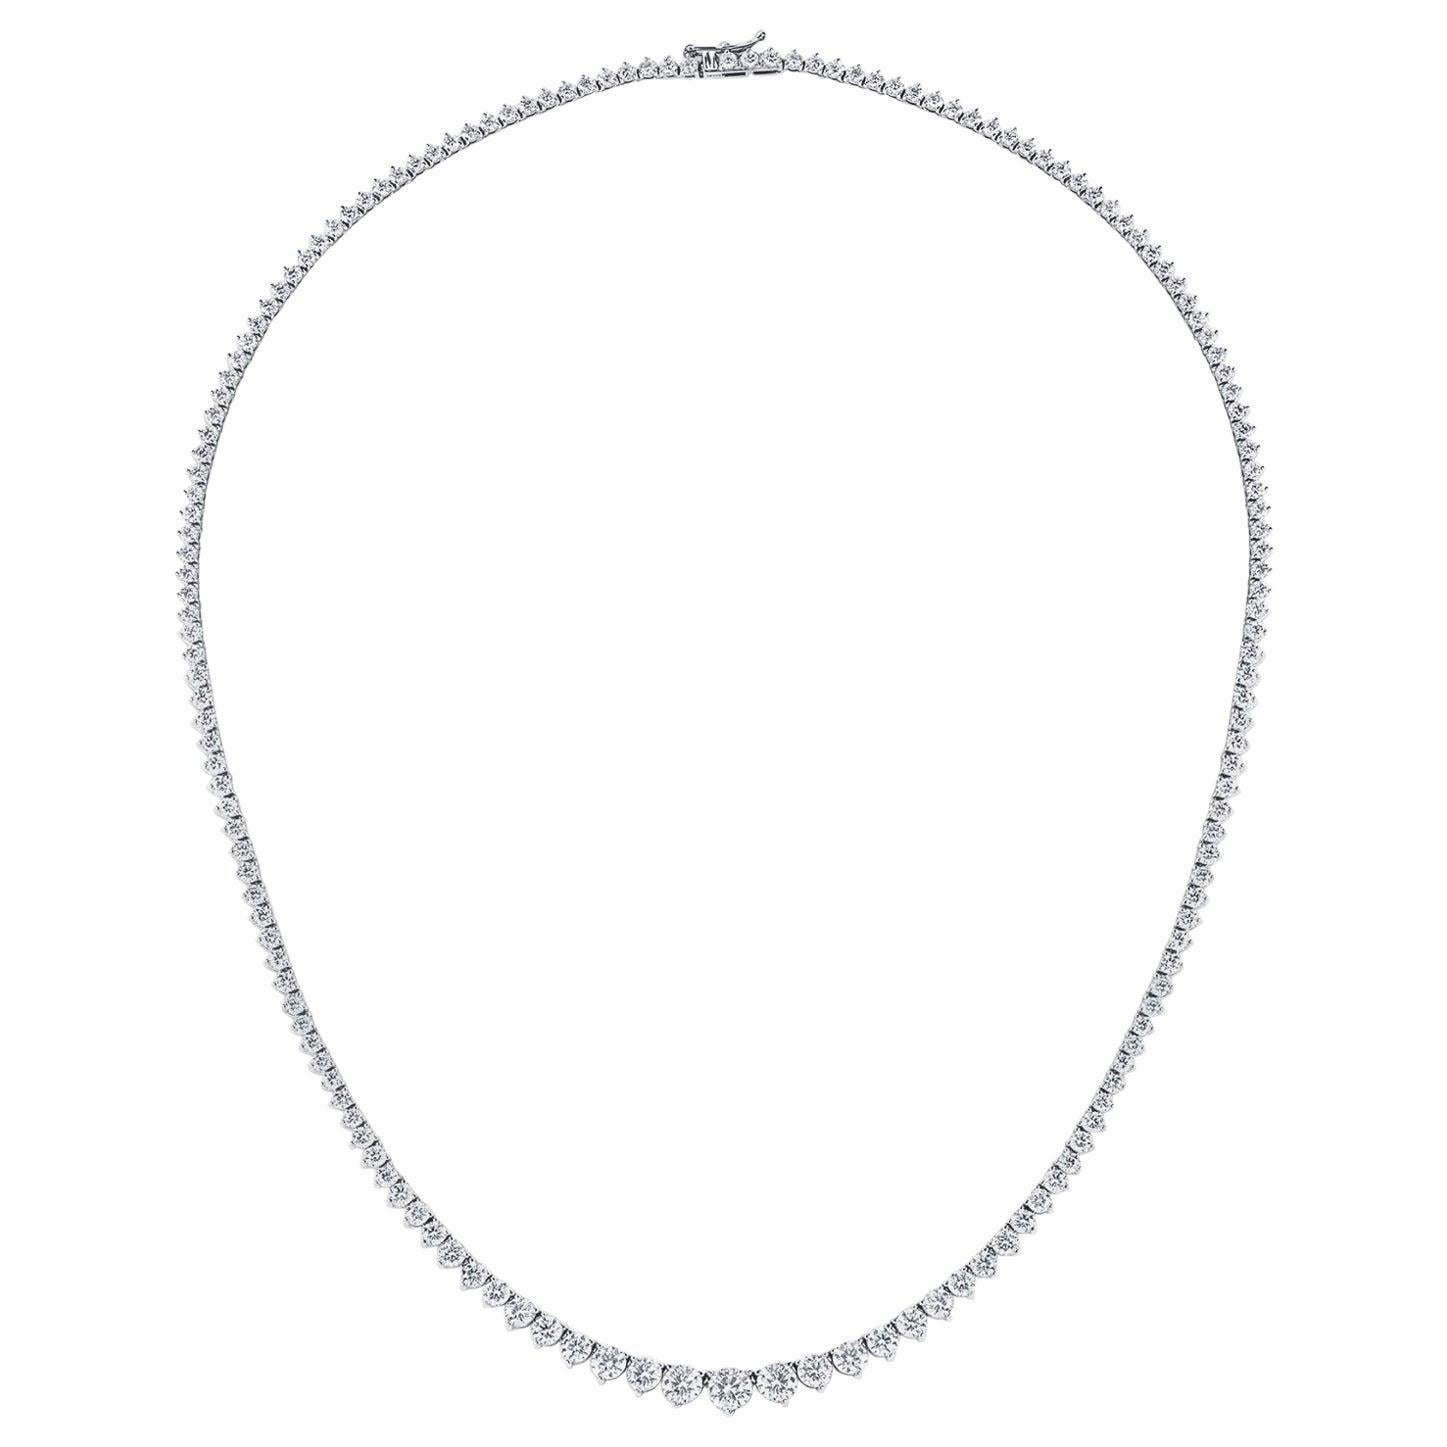 GIA Certified 10.71 Carat Diamond Graduated Riviera Necklace